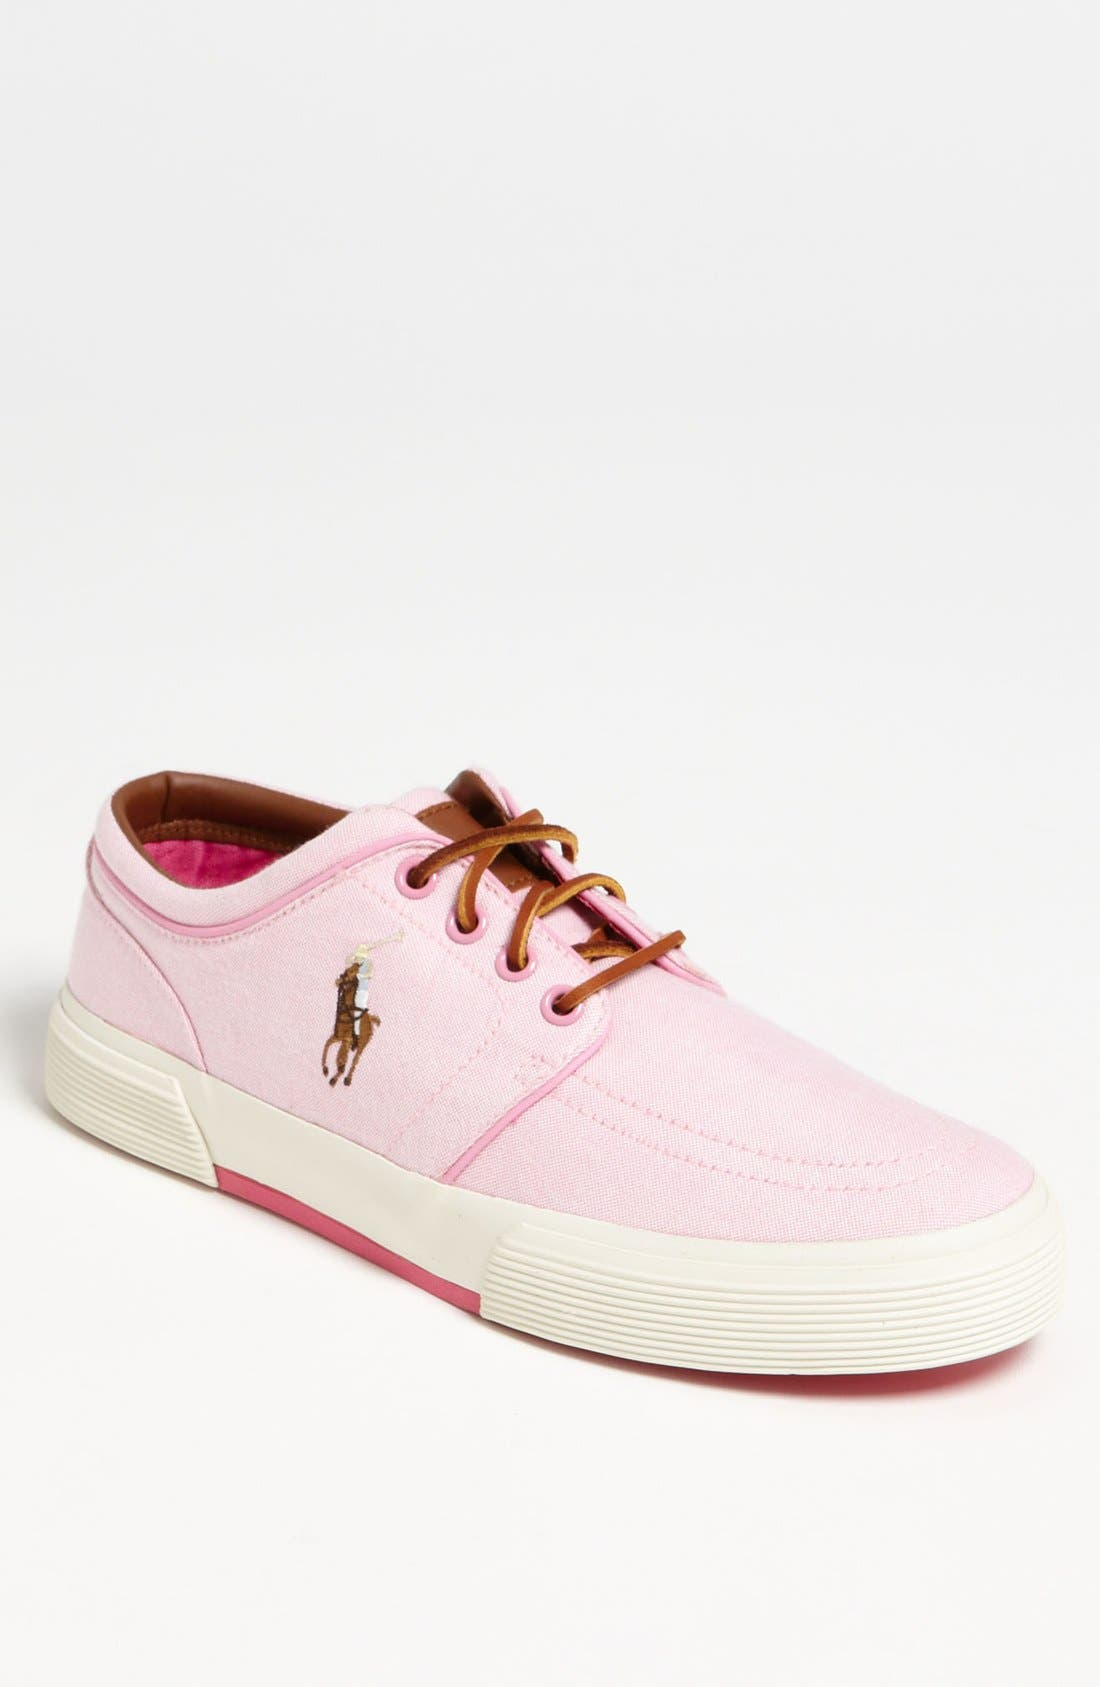 Alternate Image 1 Selected - Polo Ralph Lauren 'Faxon' Sneaker (Men)